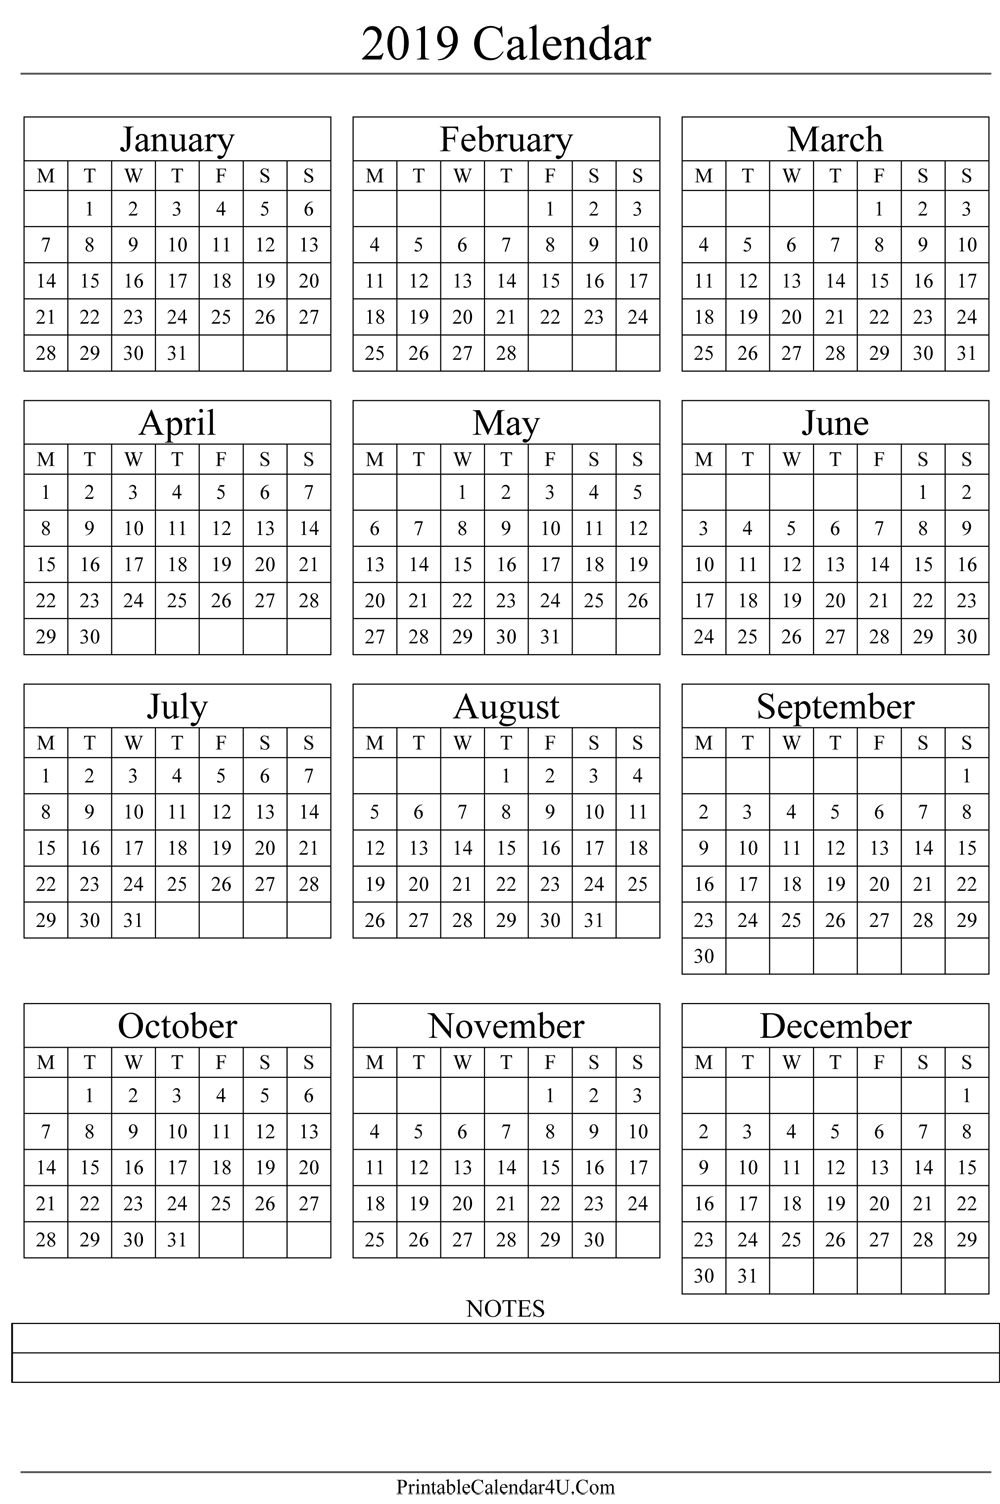 Annual Calendar 2019 Portrait Printable Calendar 2017 | Gift Ideas Calendar 2019 Year Printable